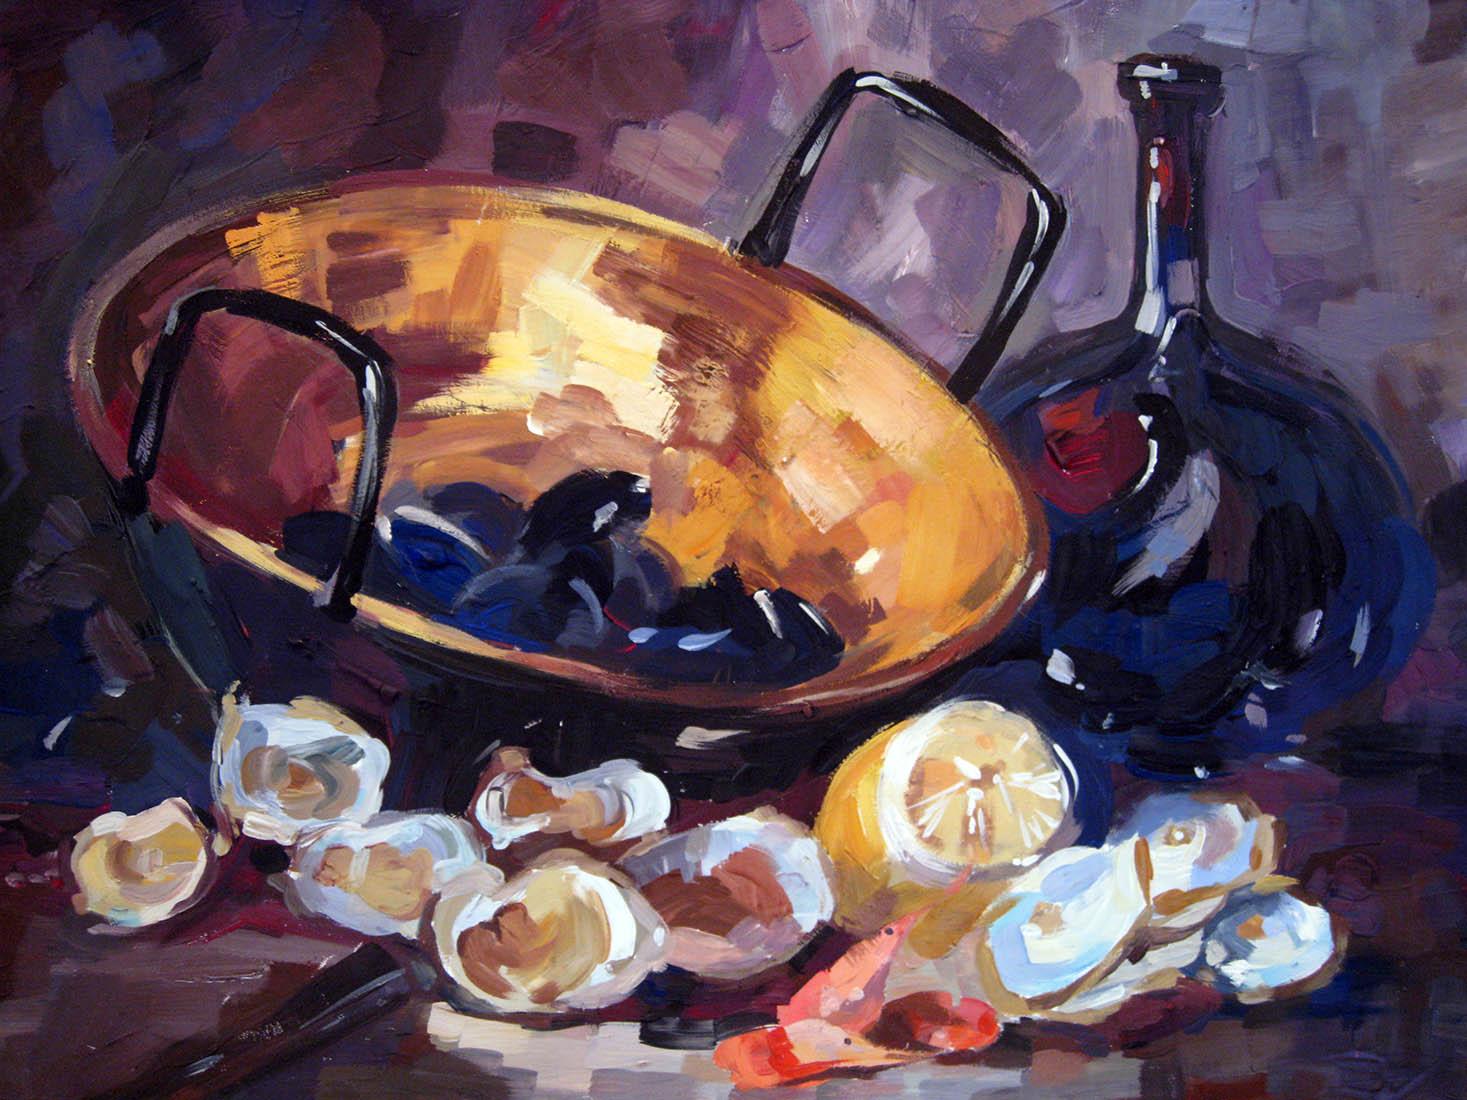 Polina-Shubkina-Paintings-010.jpg